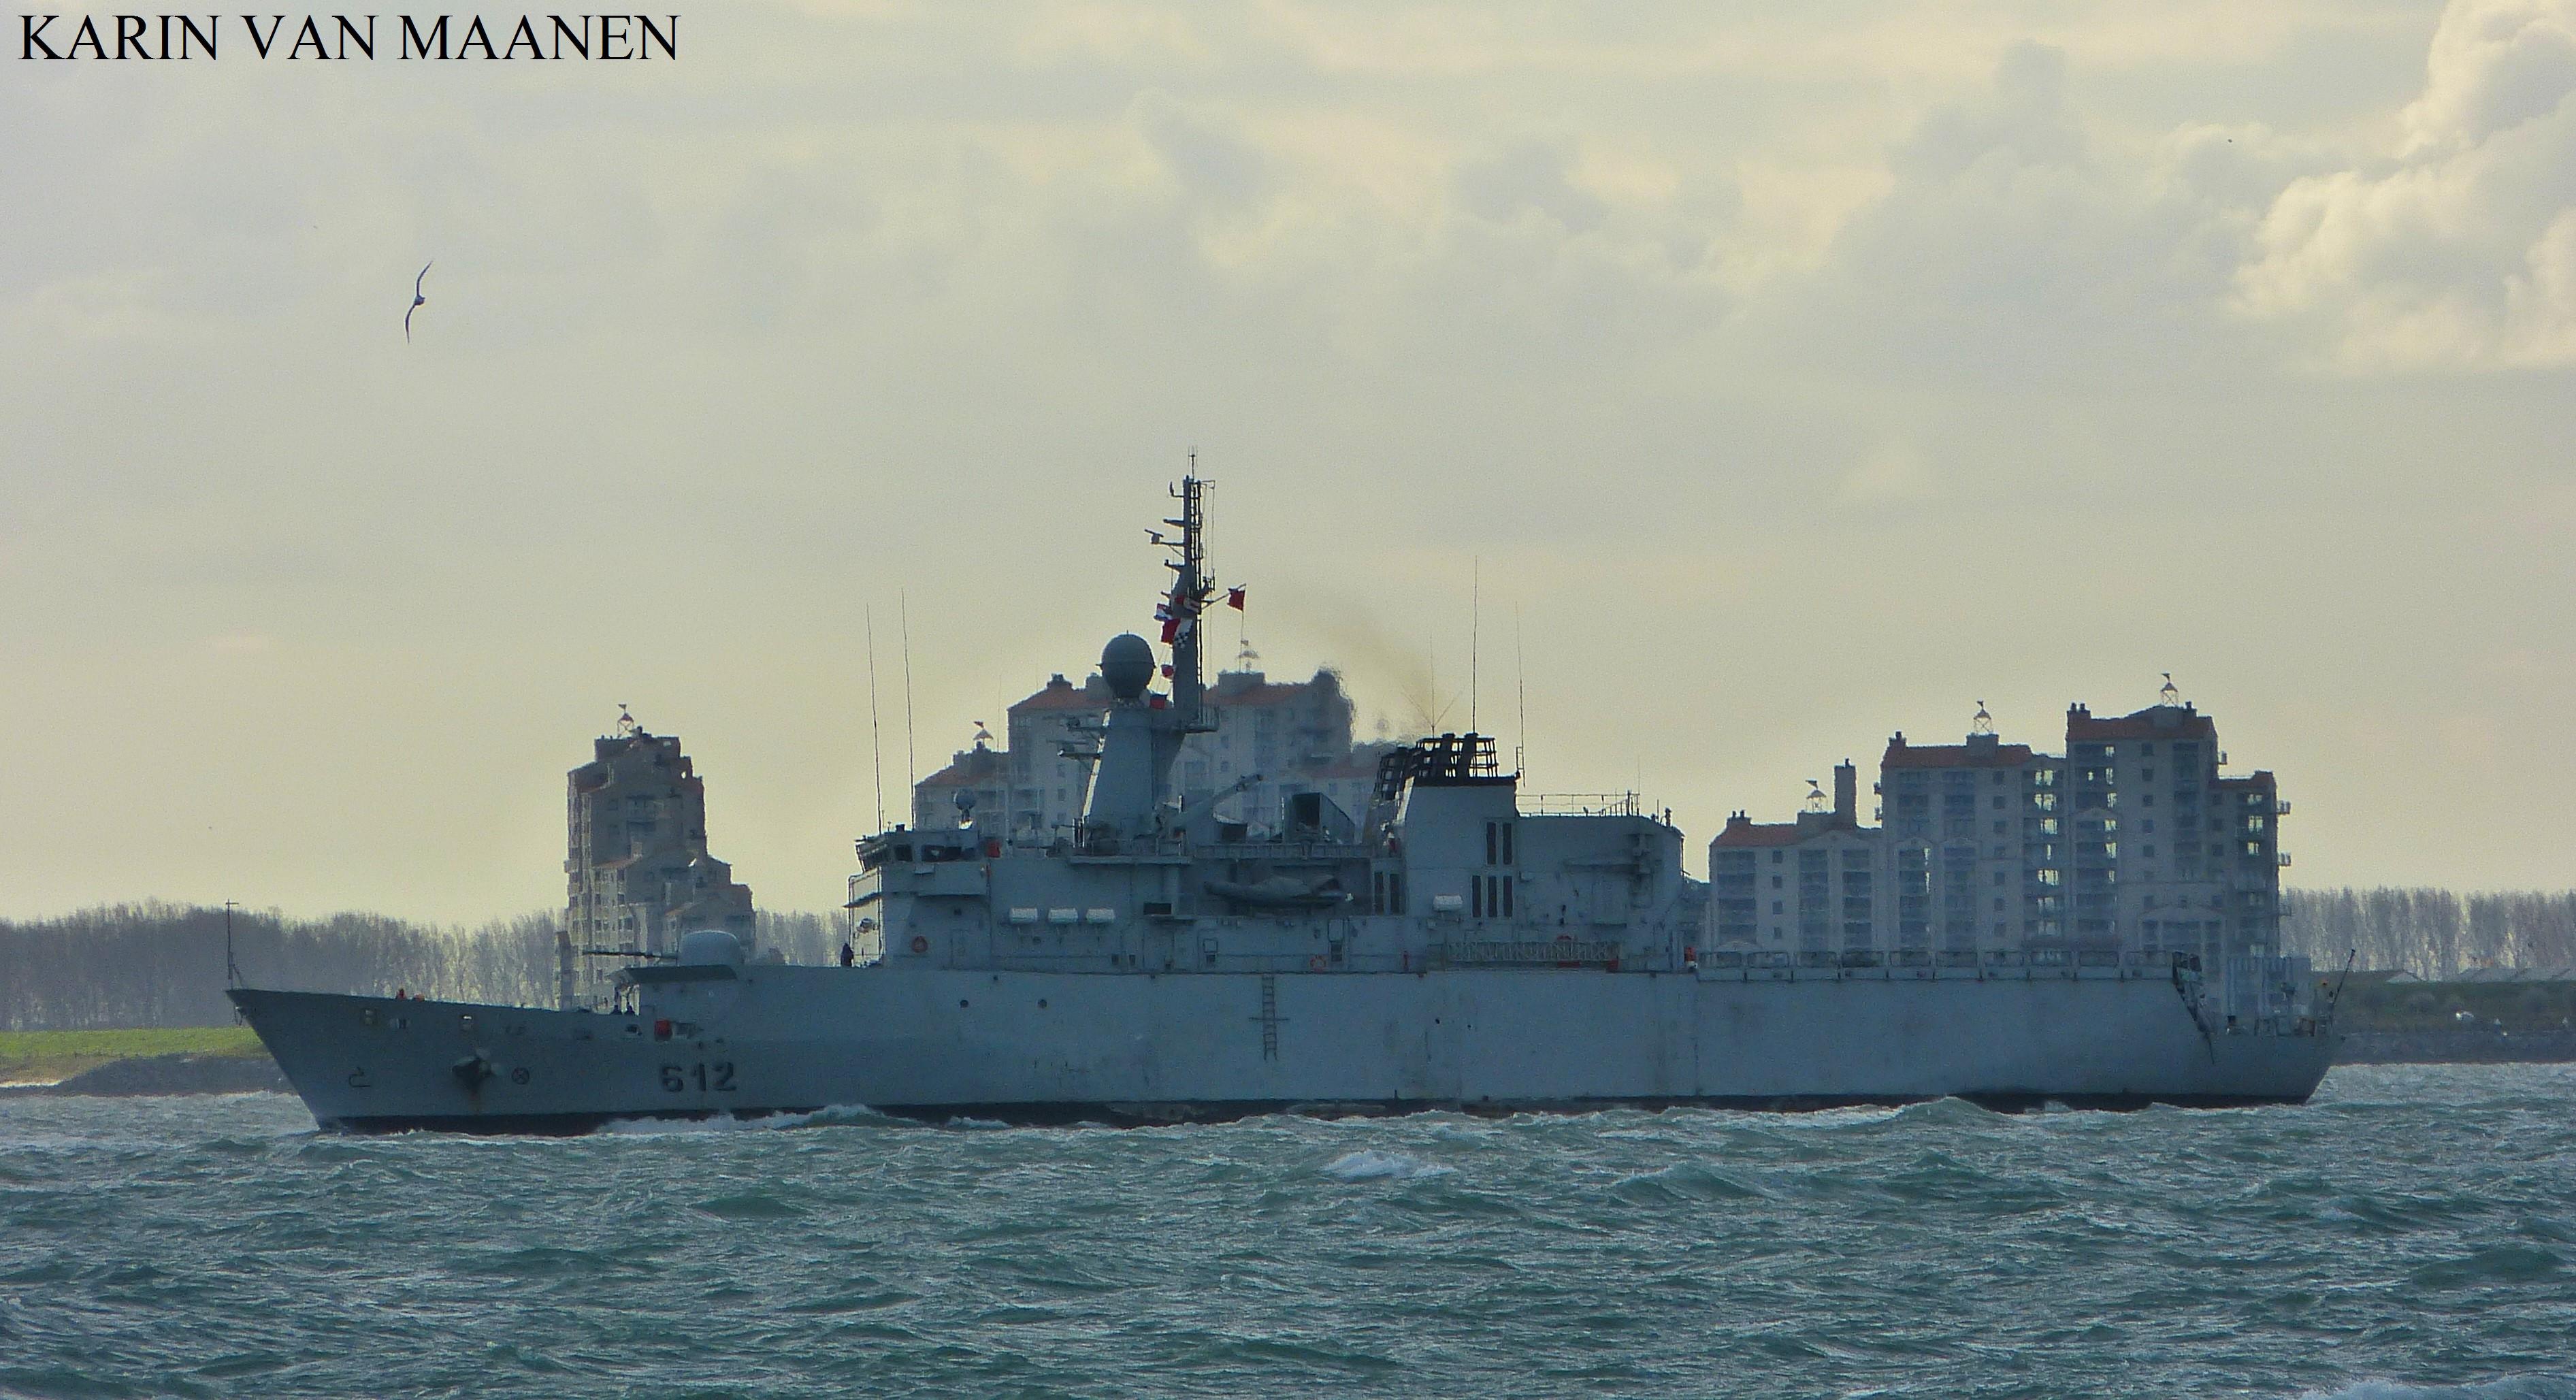 Royal Moroccan Navy Floréal Frigates / Frégates Floréal Marocaines - Page 12 Moroccan_light_surveillance_frigate_hassan_ii_2001_by_roodbaard1958-dbtid46